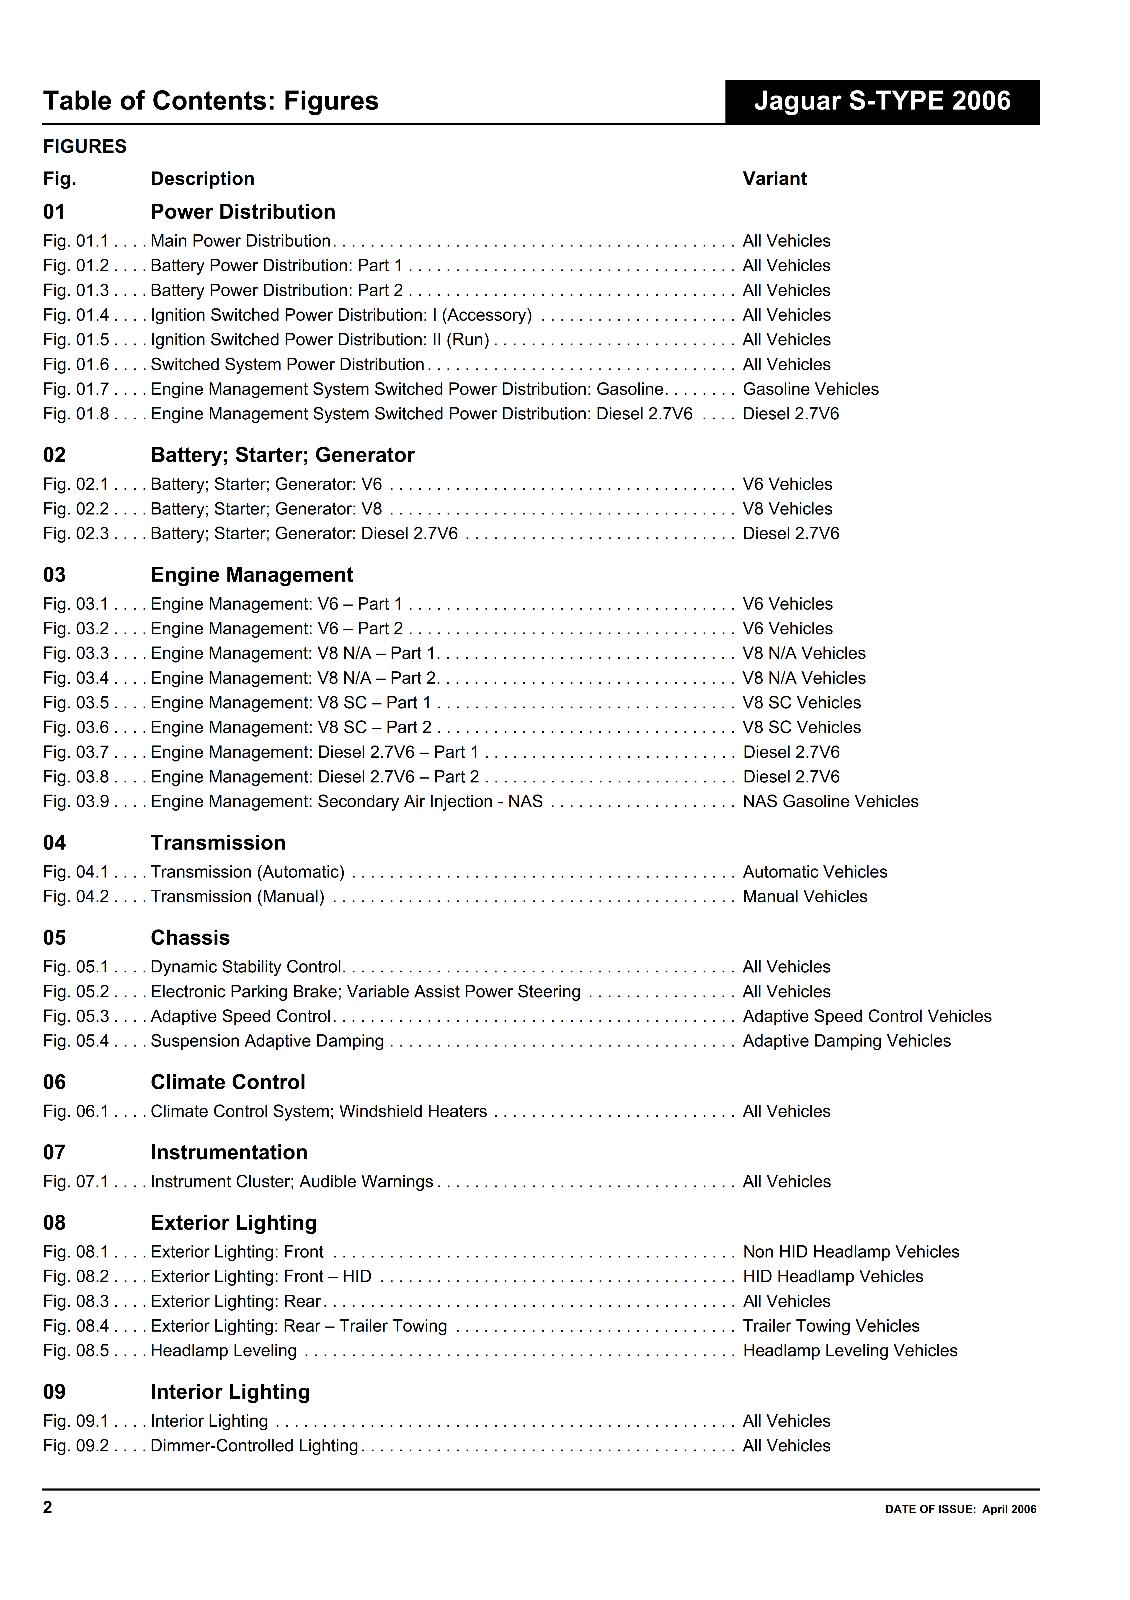 Car Manuals & Literature Service & Repair Manuals JAGUAR S-TYPE ...